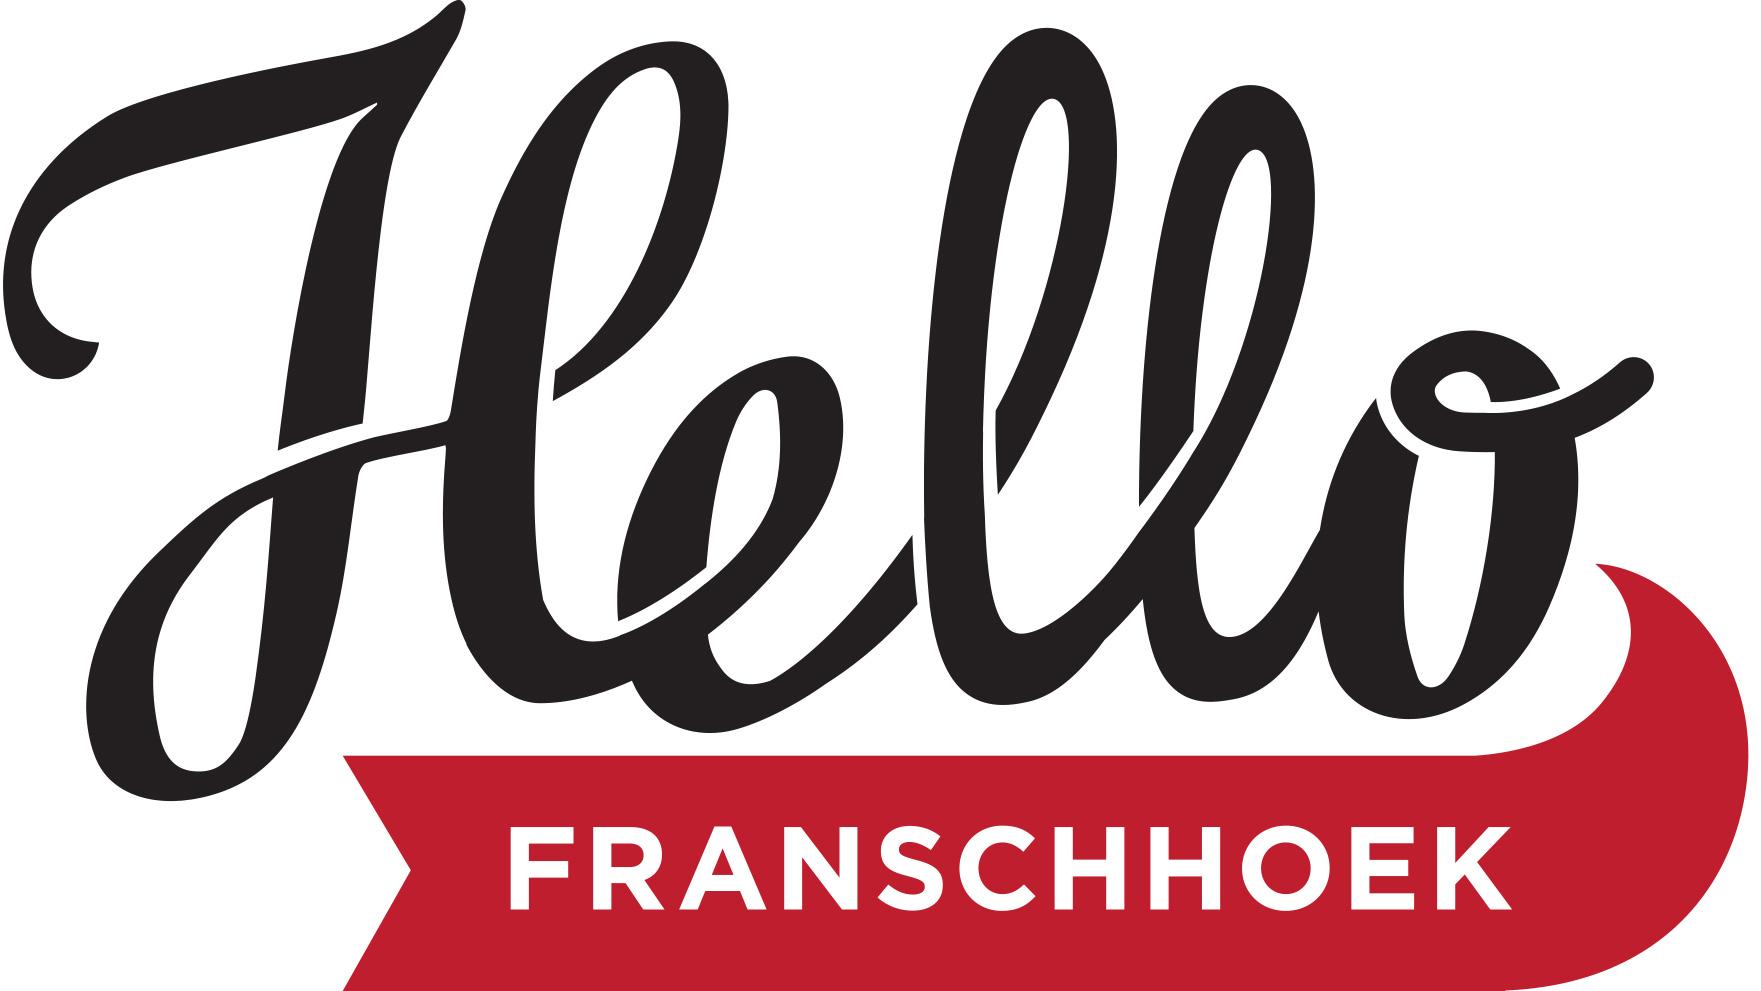 FORMAL-Hello-Franschhoek.jpg